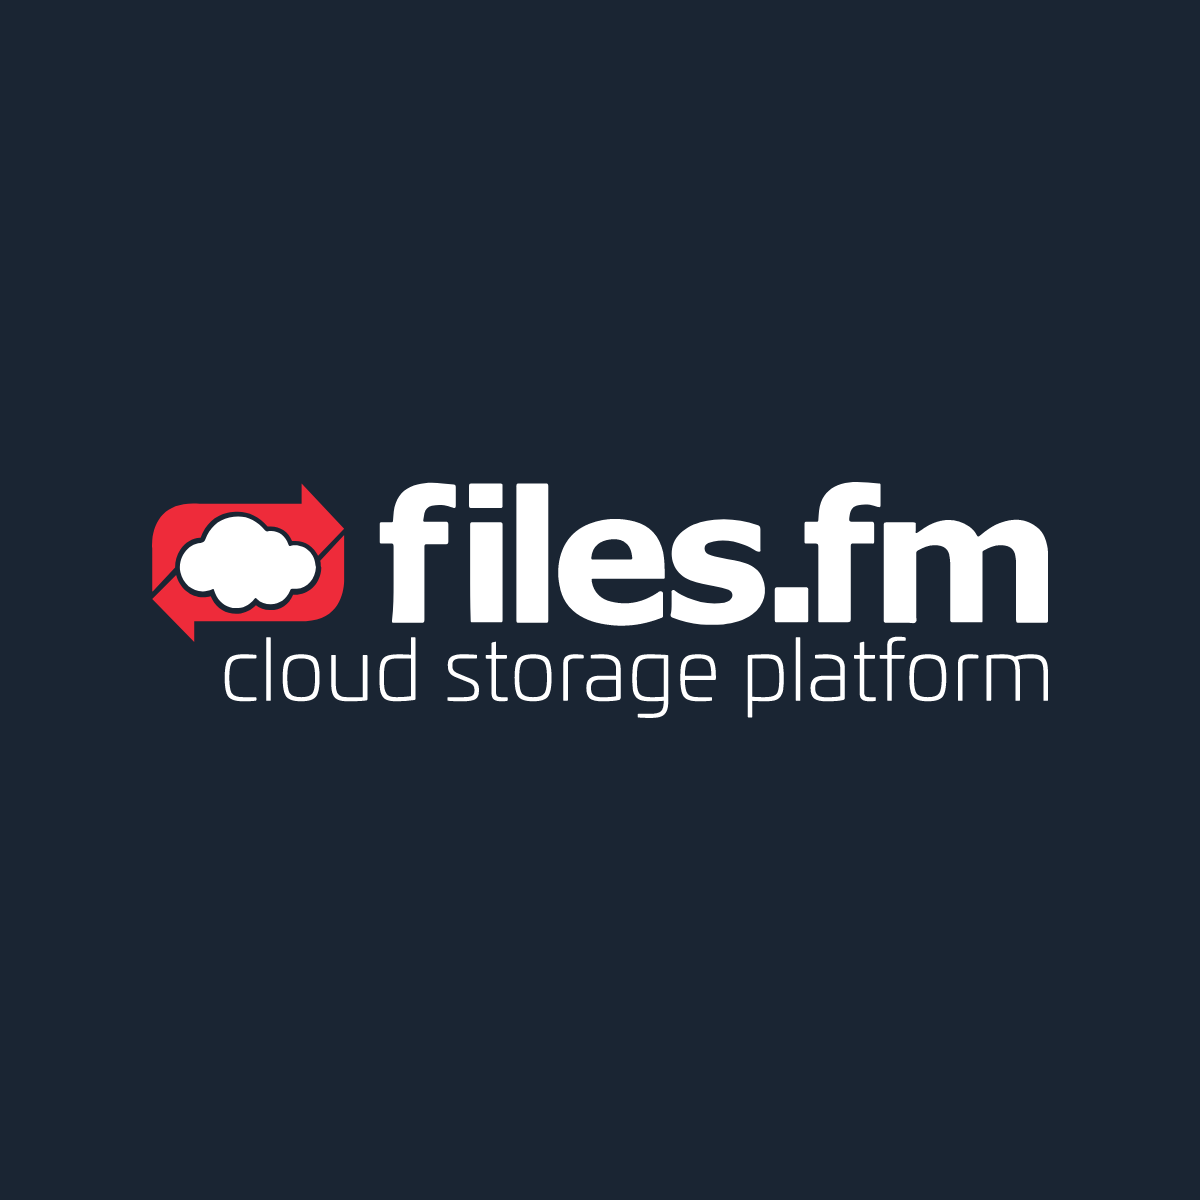 File upload, sharing and cloud backup online service